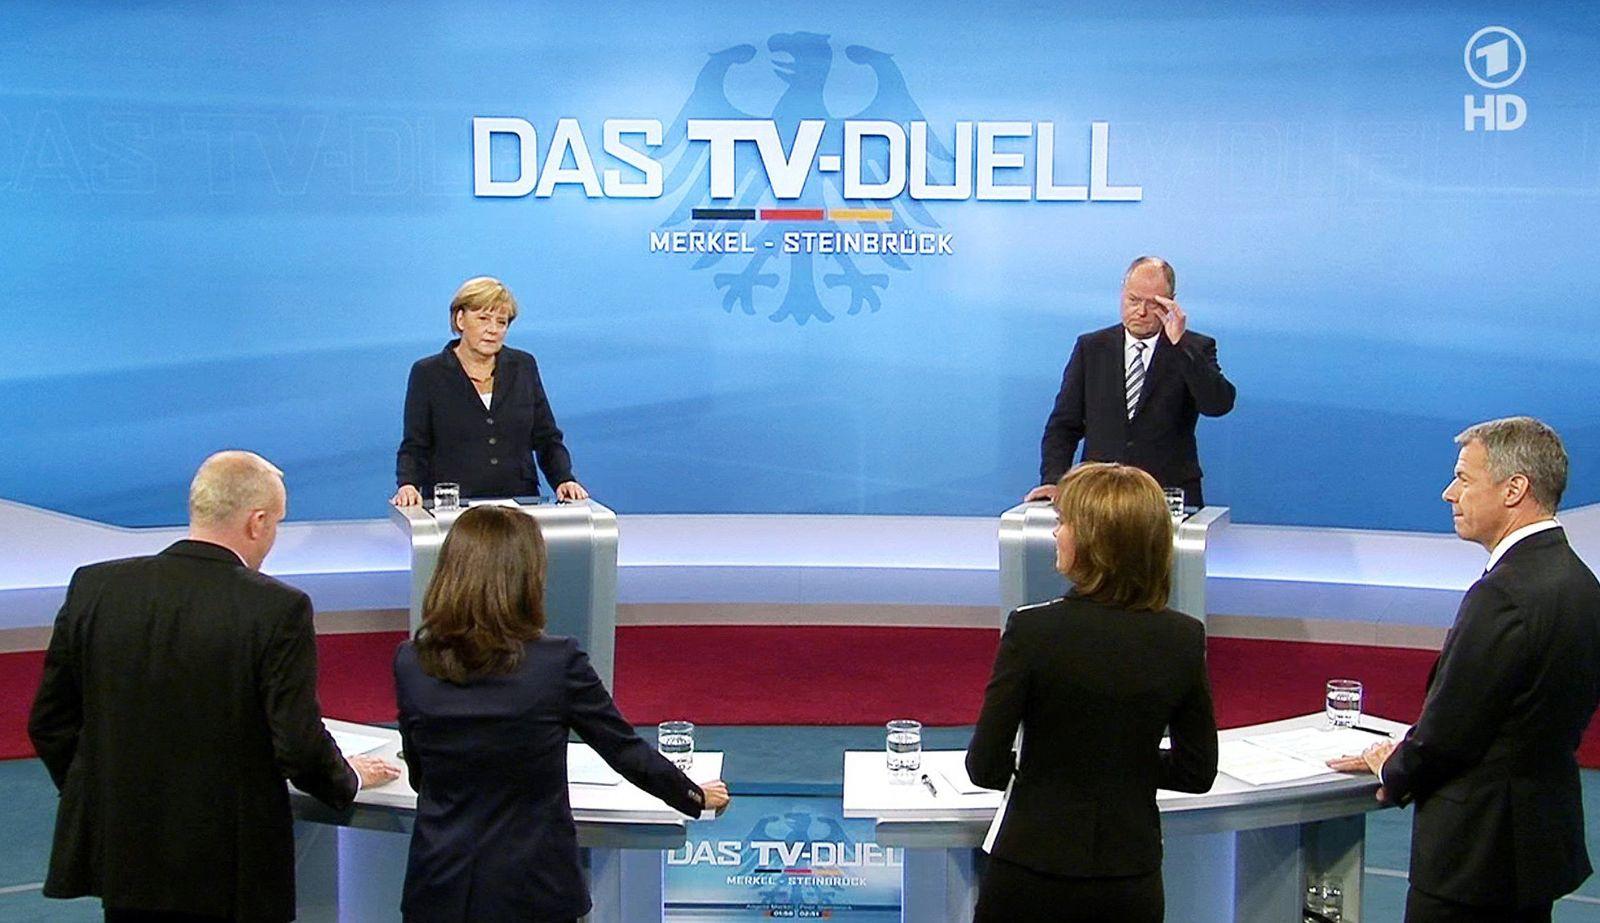 Raab/ Politisch/ Bundestagswahl 2013